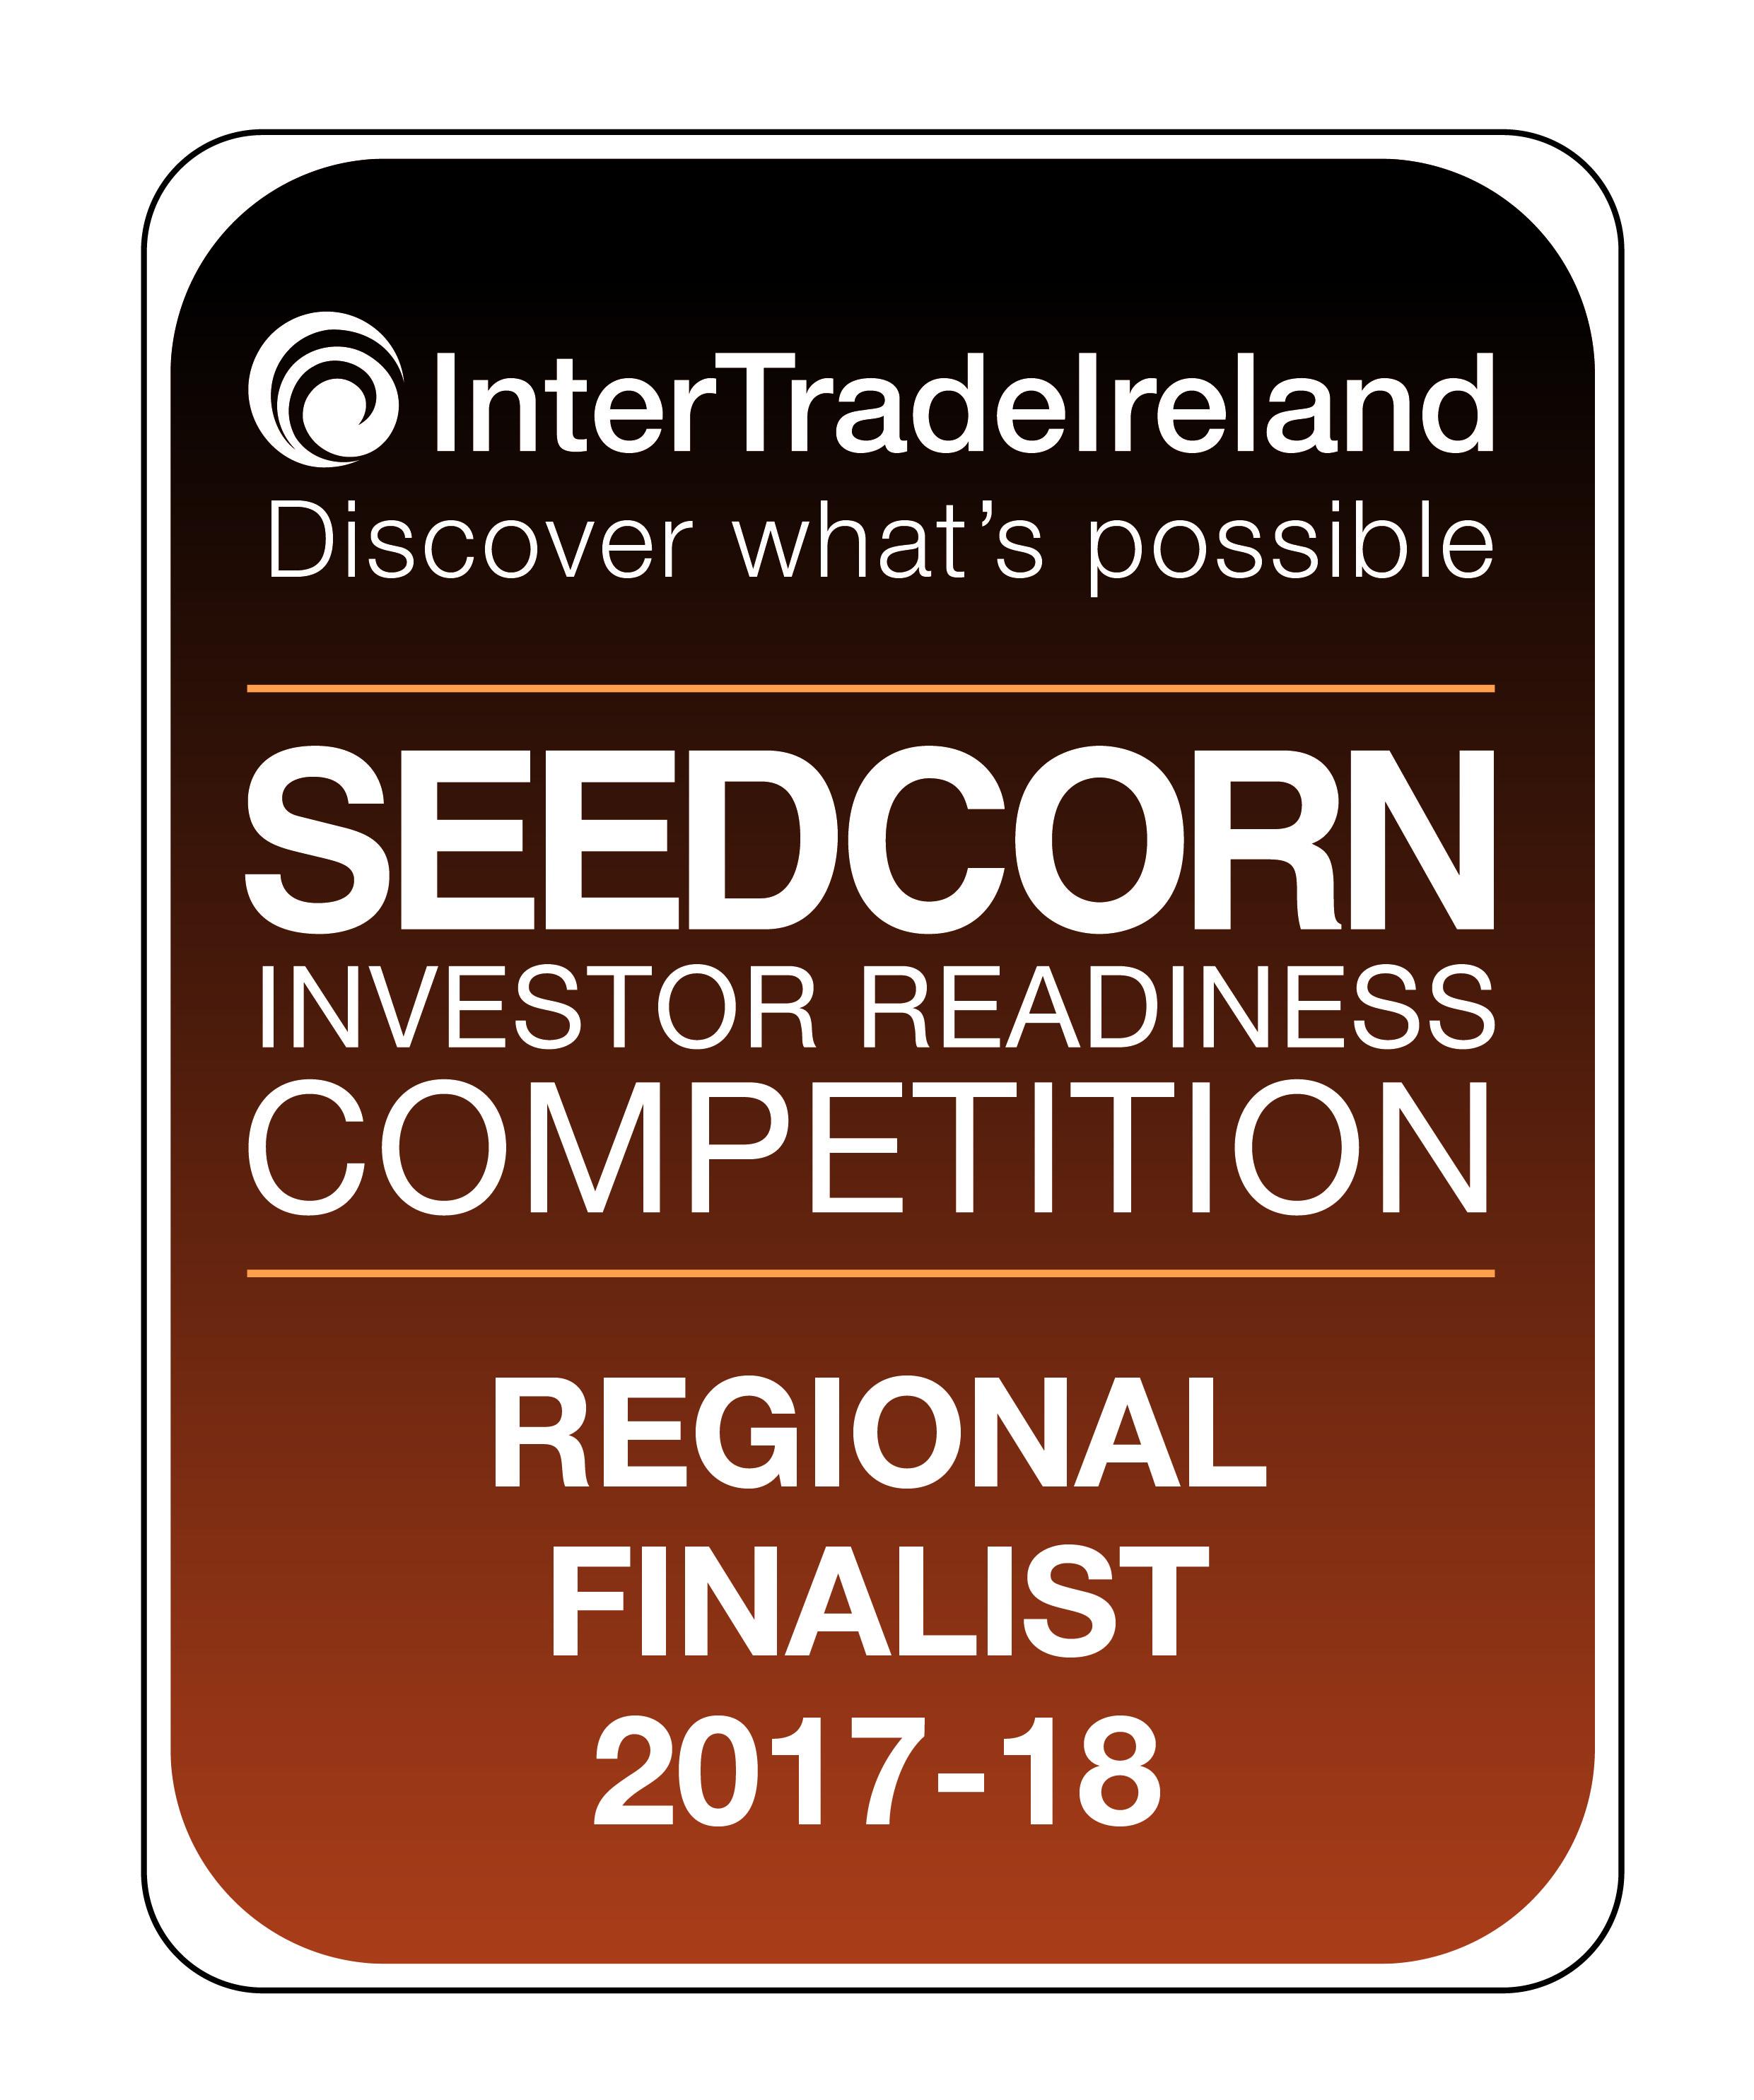 004872 ITI Seedcorn Stamps 2017_-03.jpg